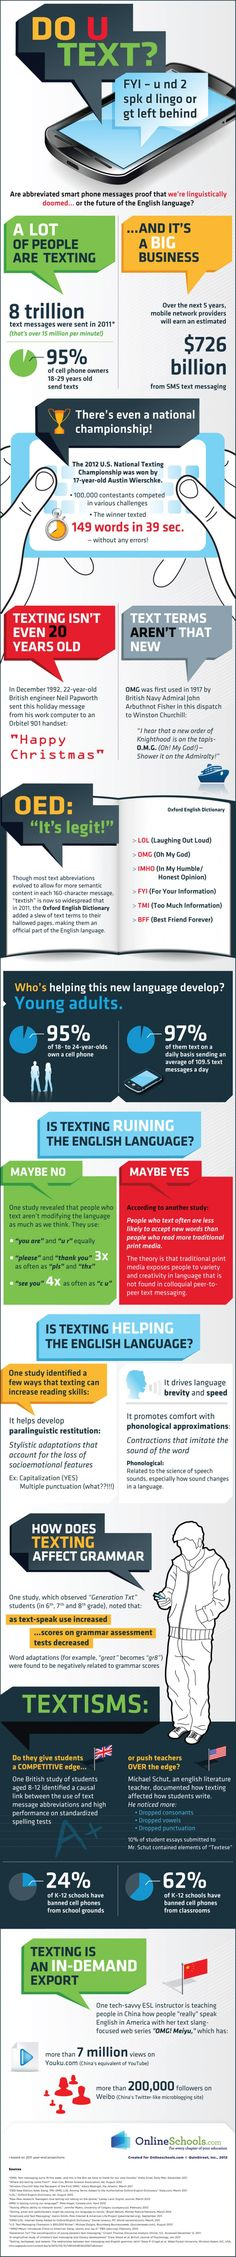 How TEXTING is changing English grammar - No B.S. University http://www.NOBSU.com